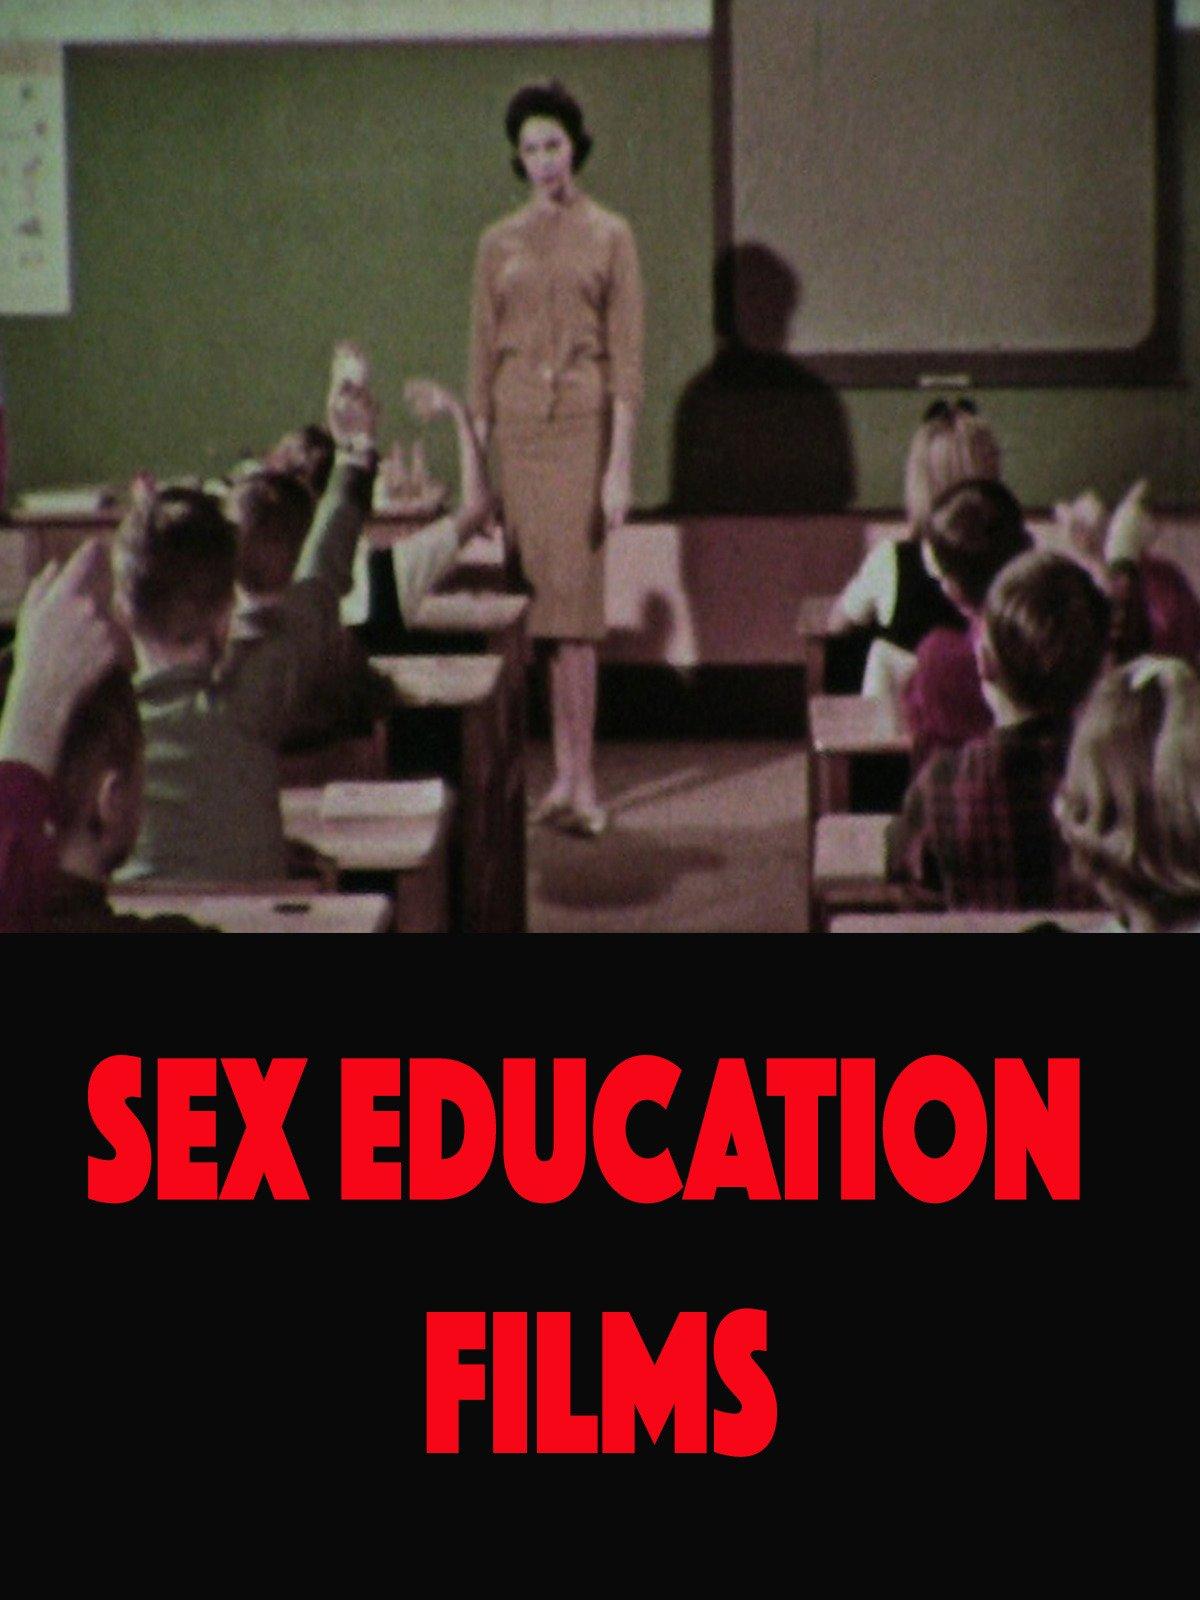 Sex stream films, amateur ebony lesbian